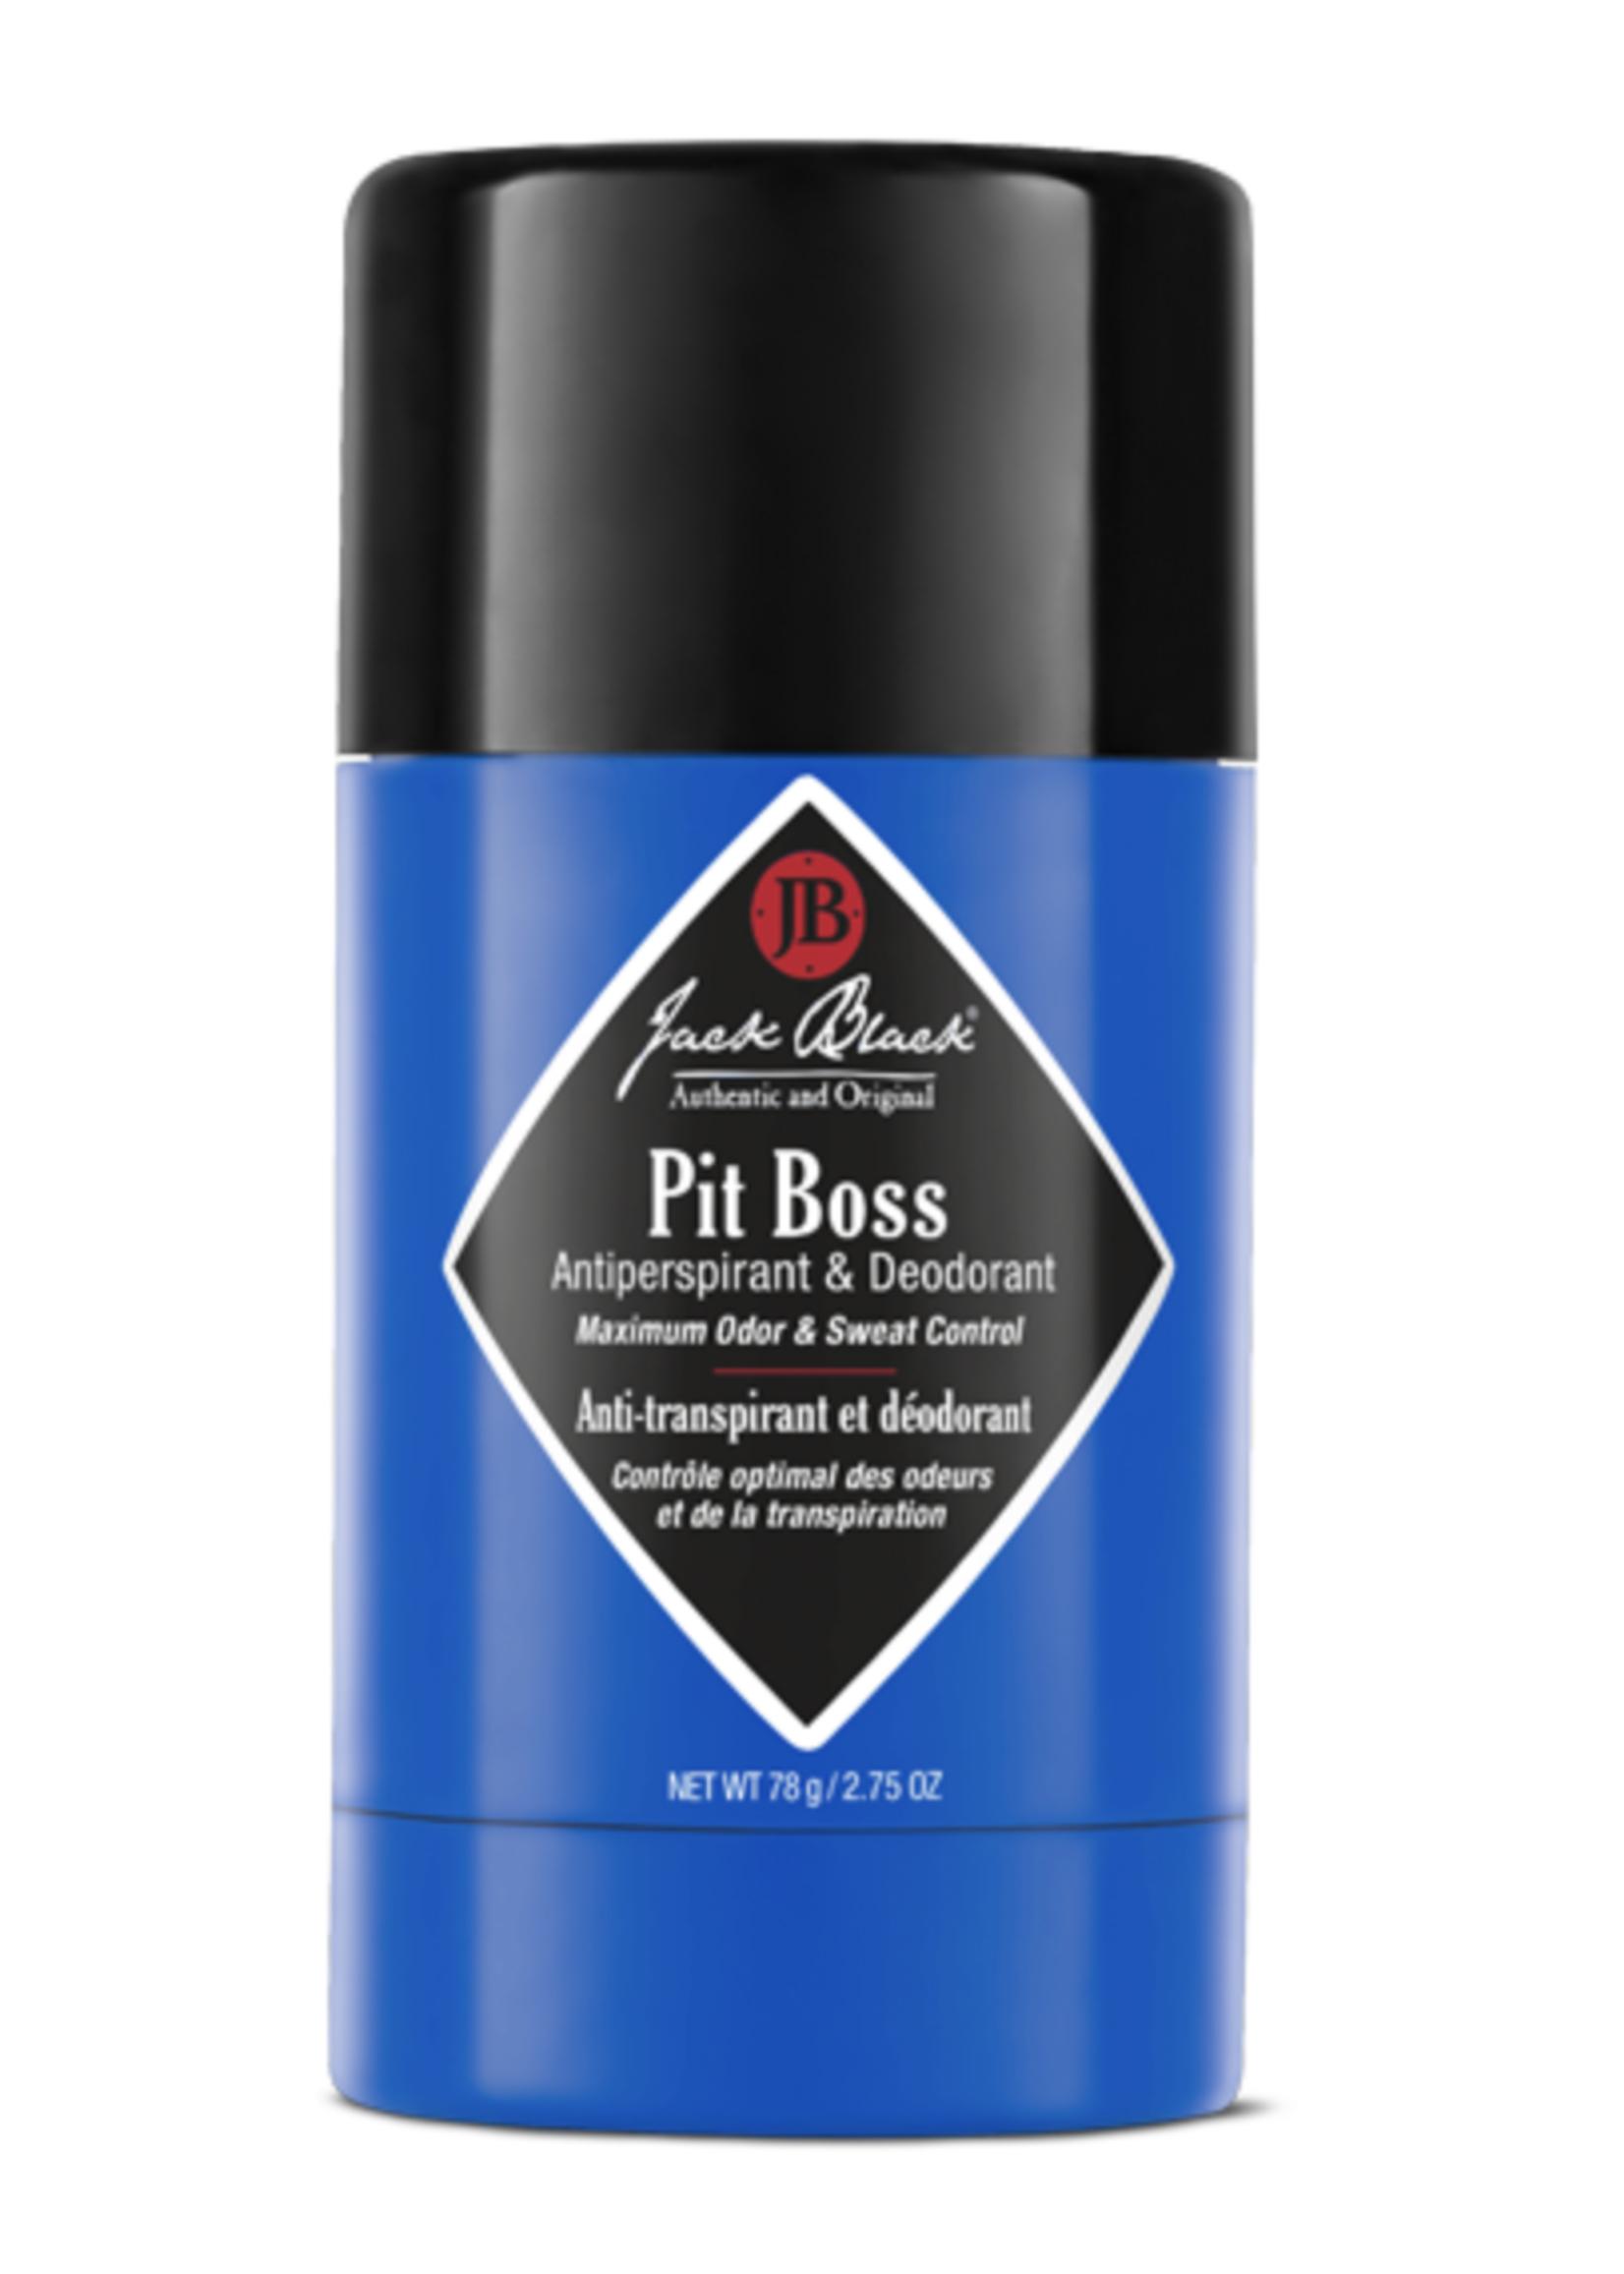 Jack Black Pit Boss Antiperspirant and Deodorant, 2.75 oz.